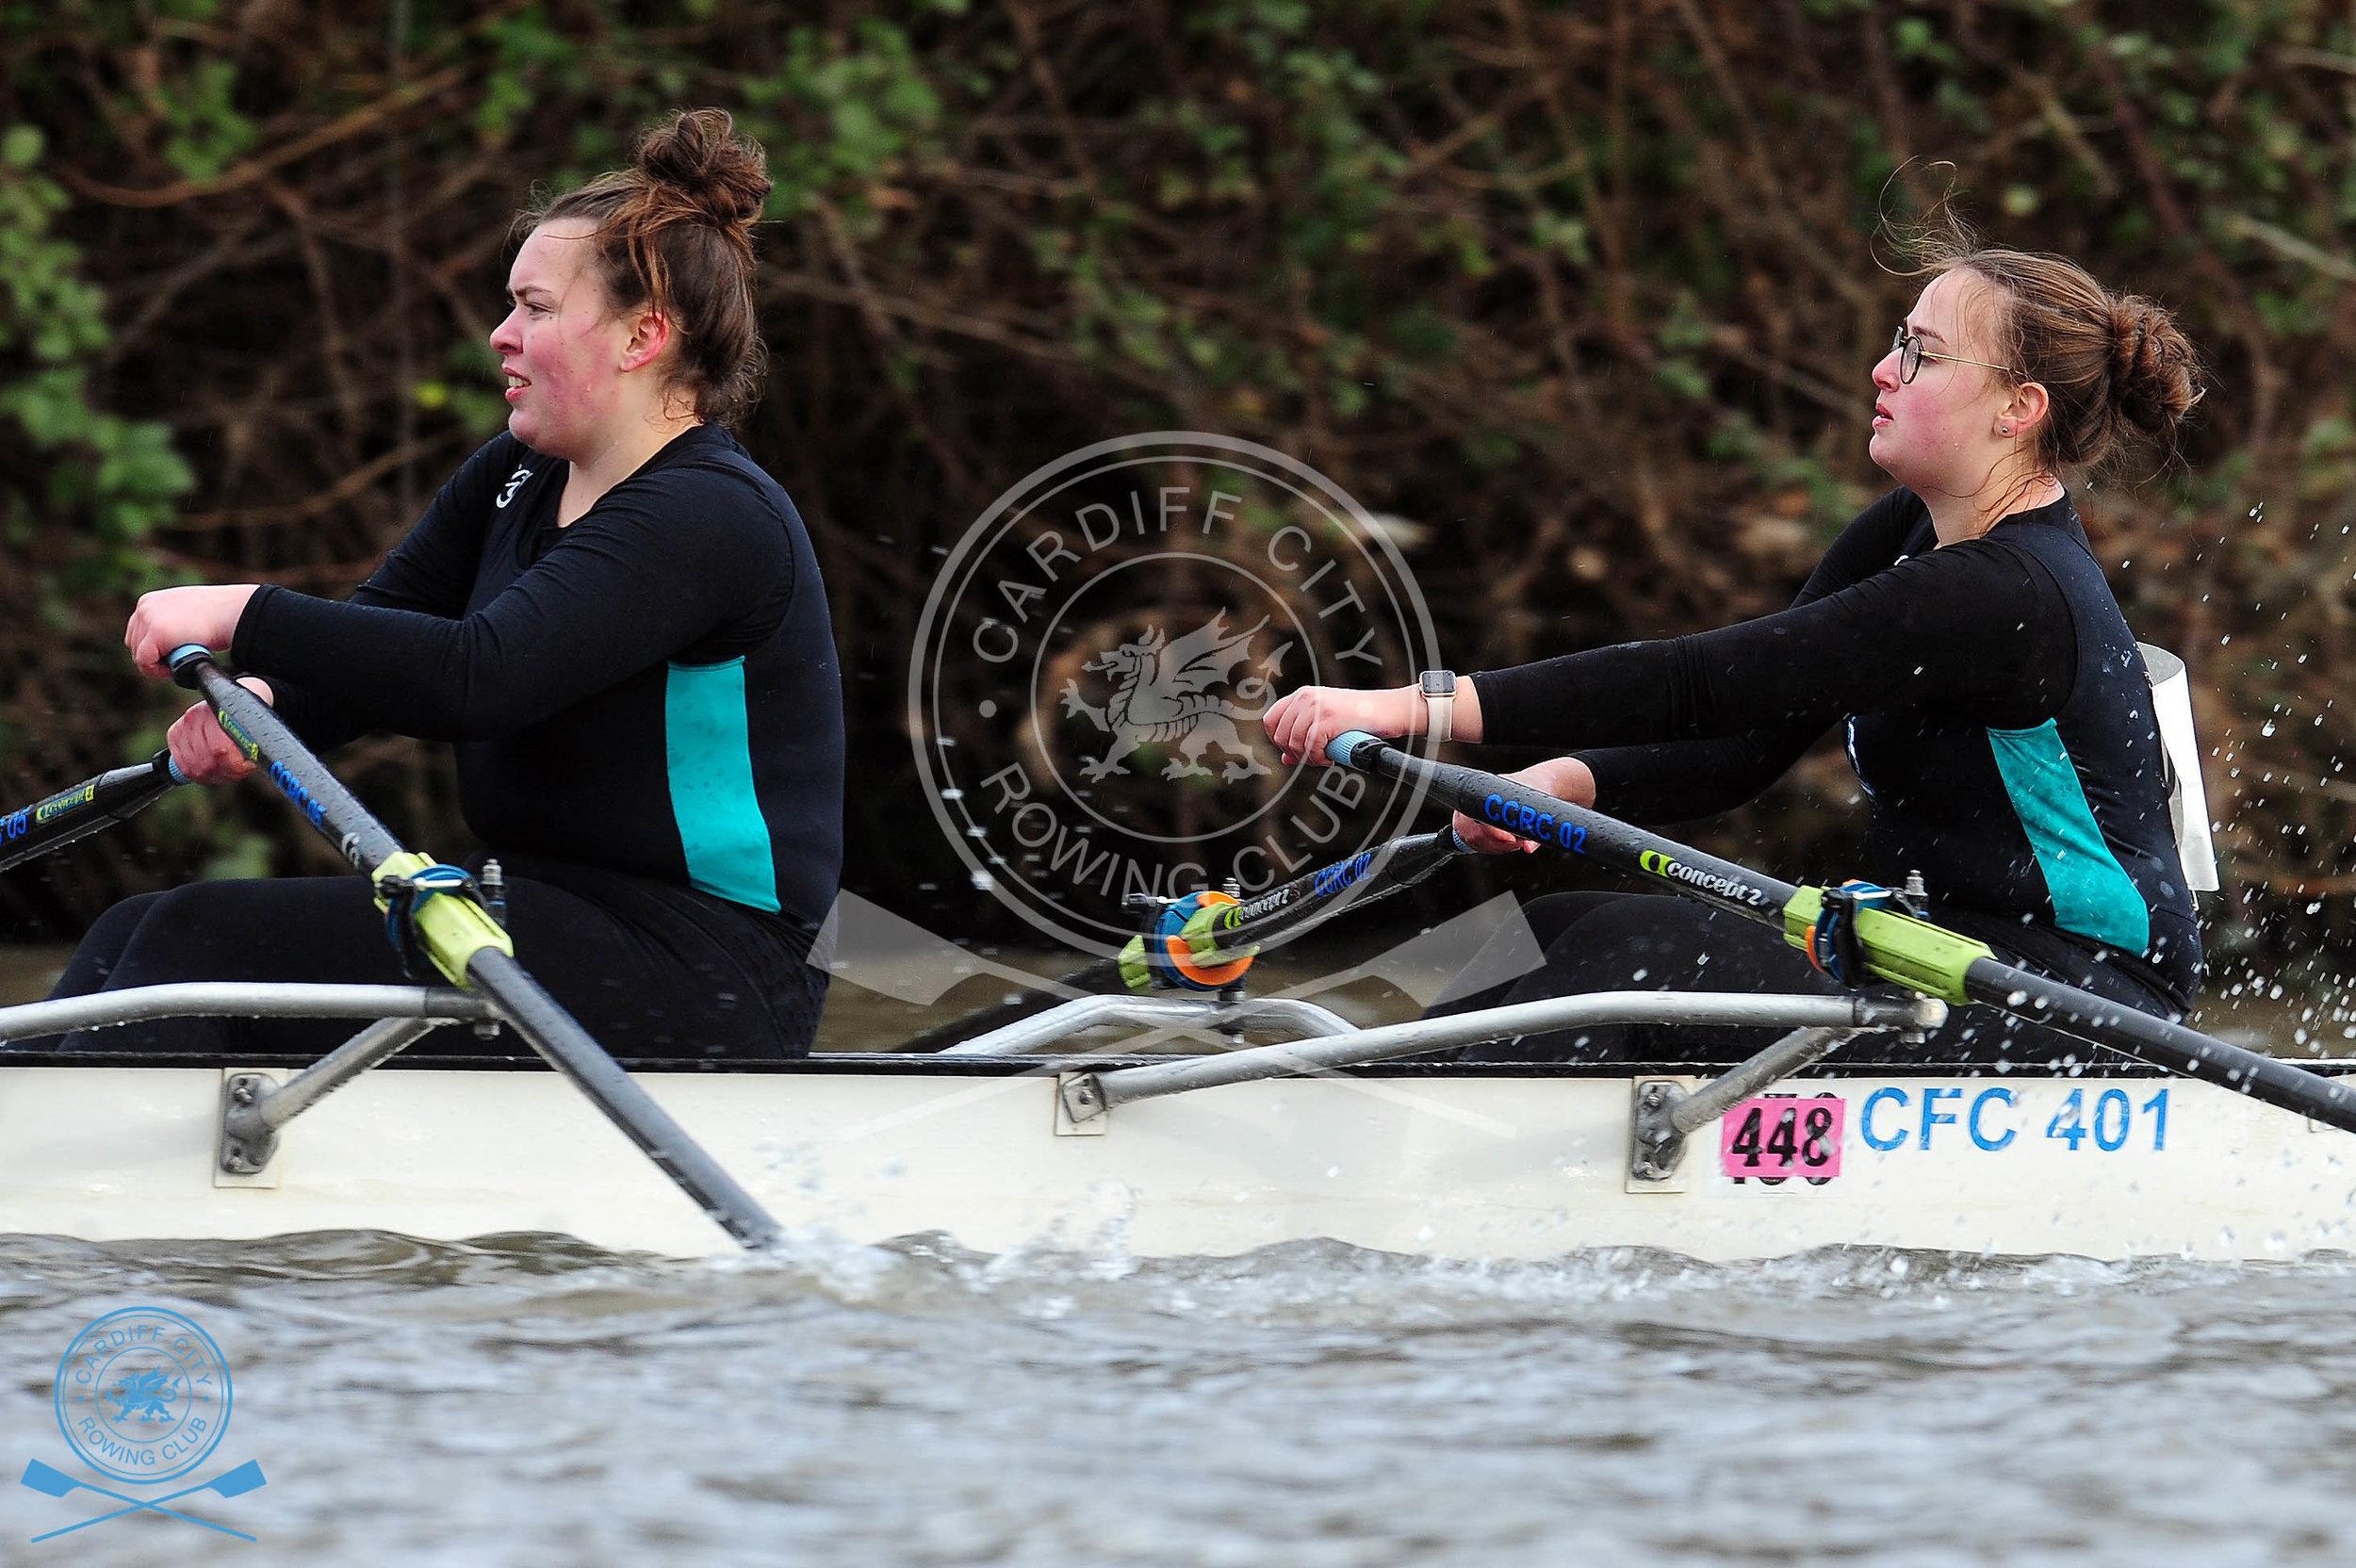 DW_280119_Cardiff_City_Rowing_278.jpg